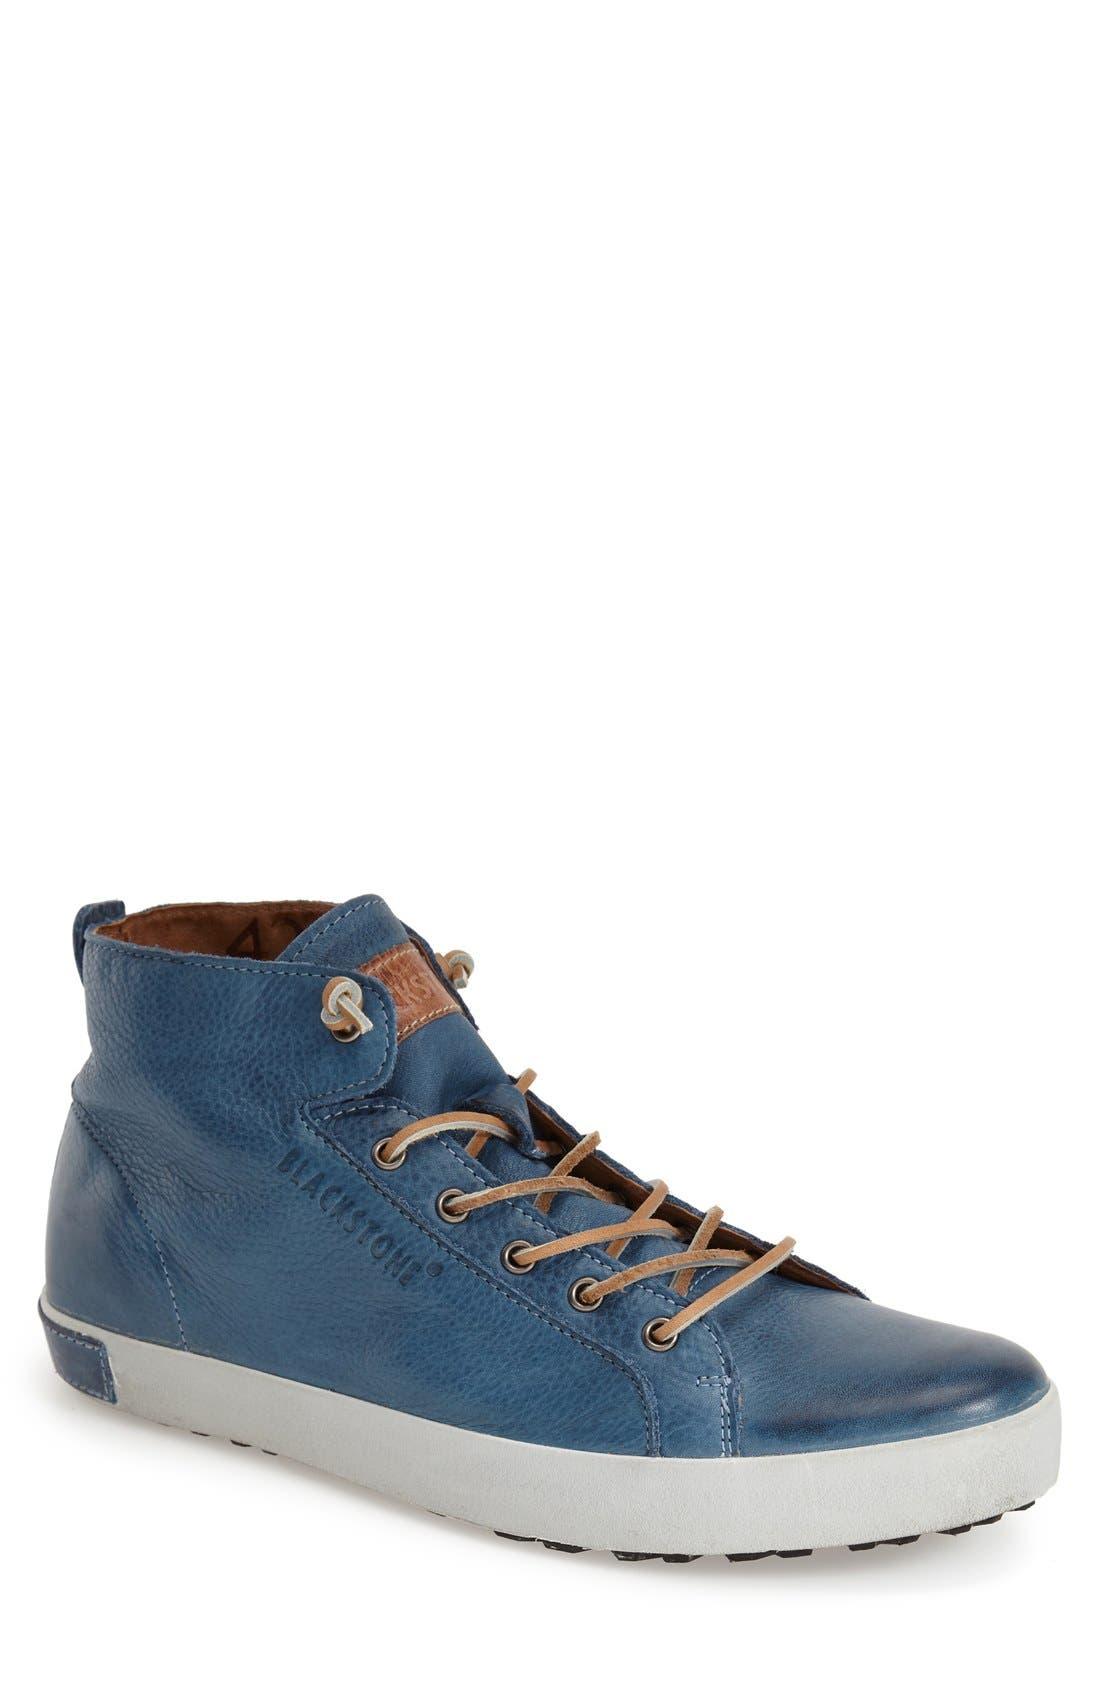 'JM03' Sneaker,                             Main thumbnail 1, color,                             Light Indigo Leather